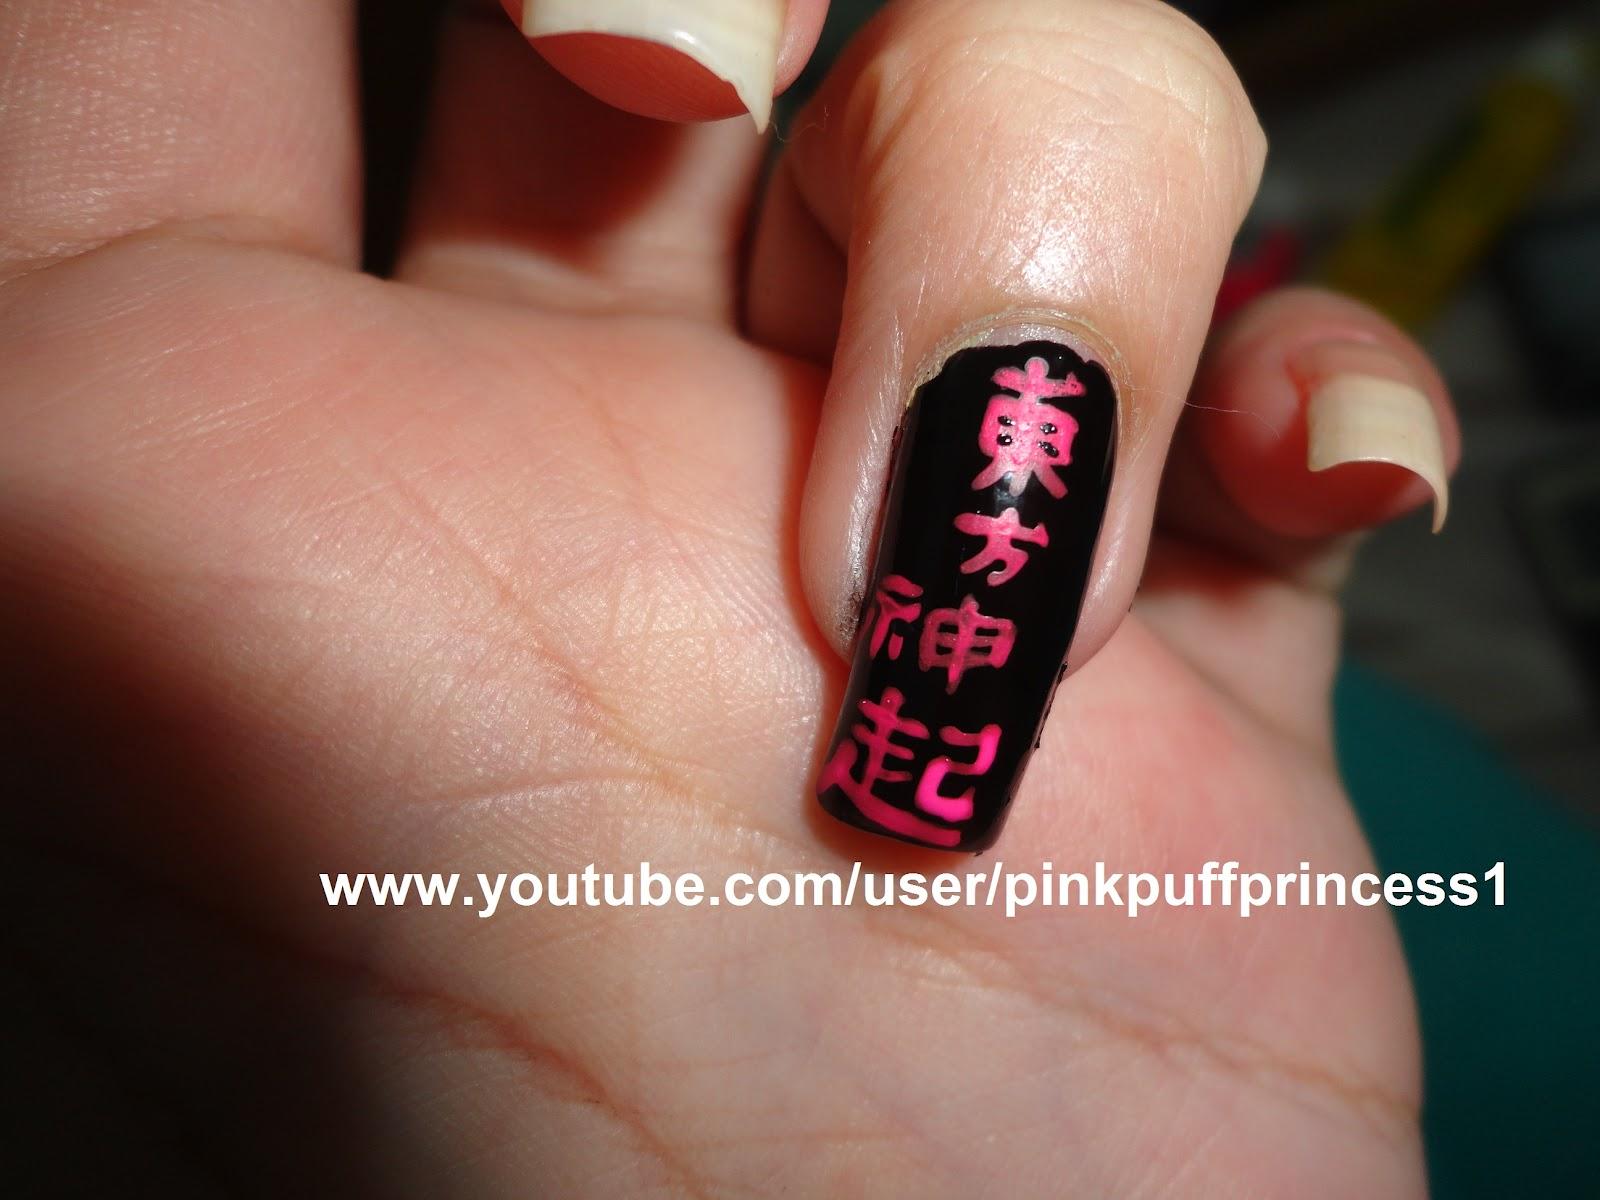 pinkpuff prince blog kpop nail art ������� dbsktvxq logo